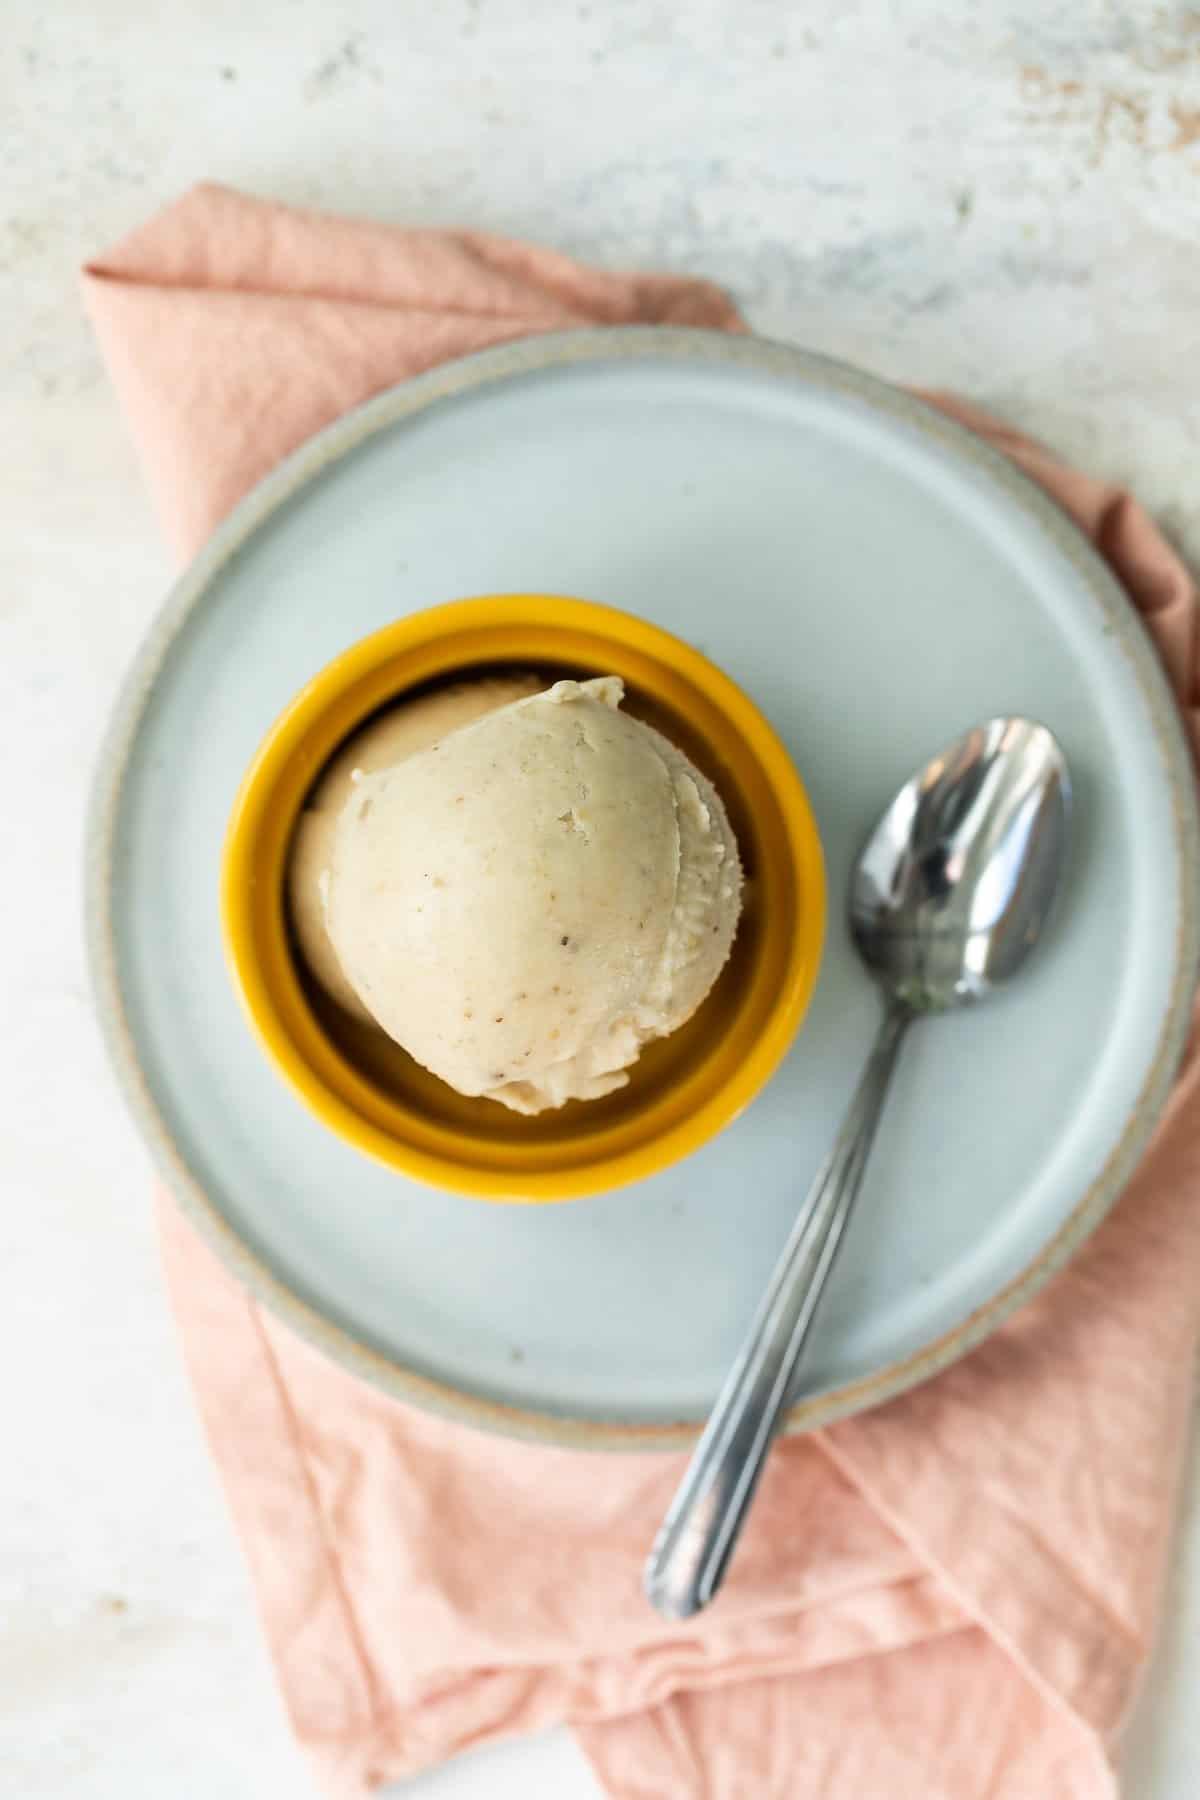 Bowl of banana frozen yogurt.